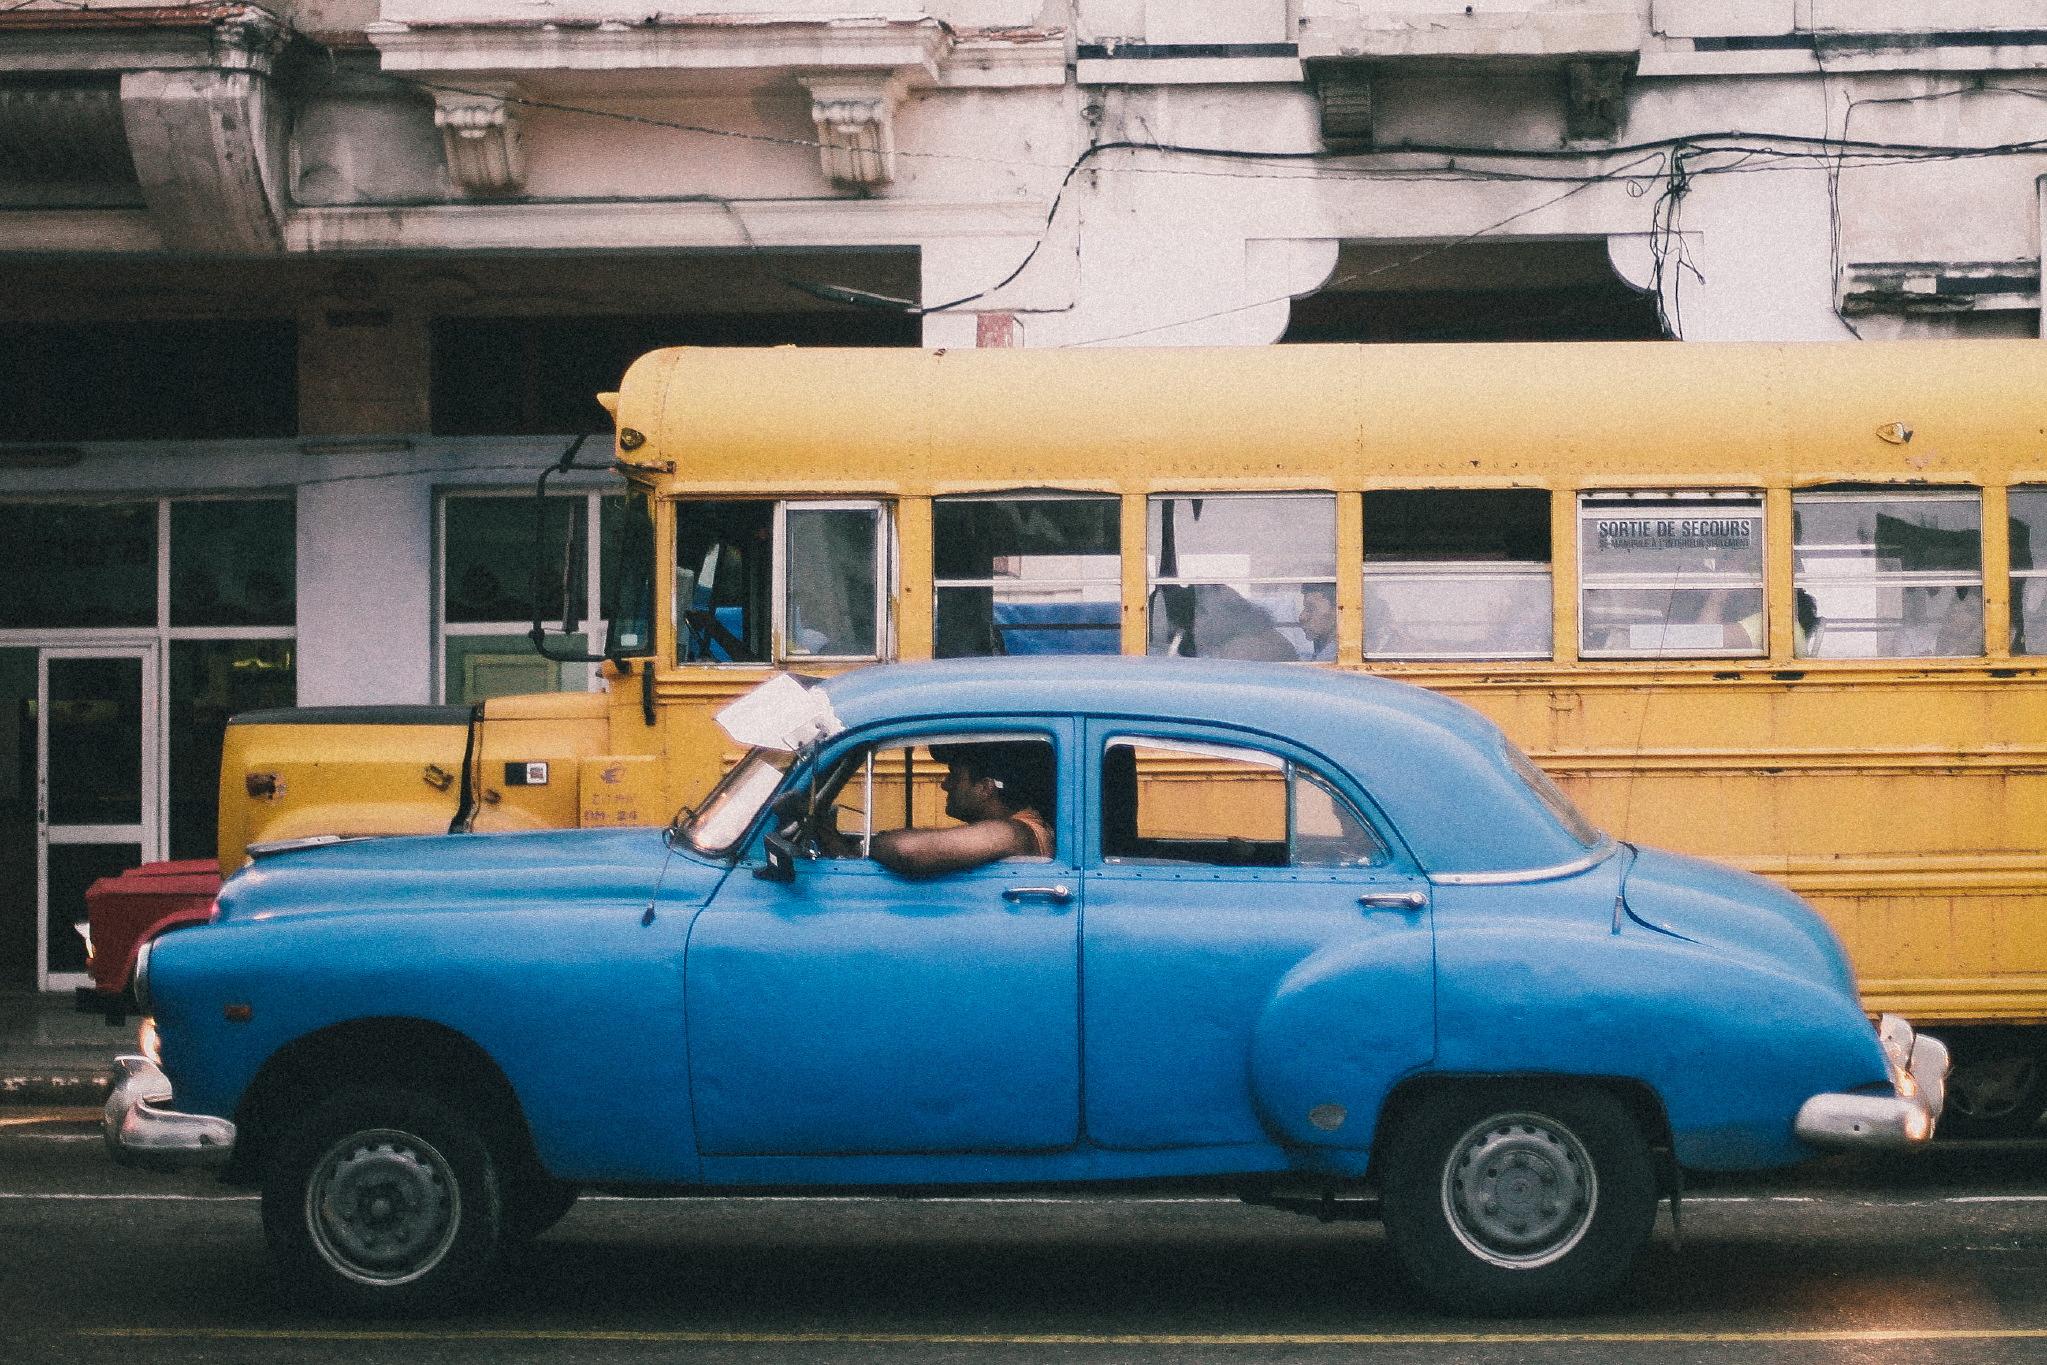 san diego wedding   photographer | blue car driving past yellow bus